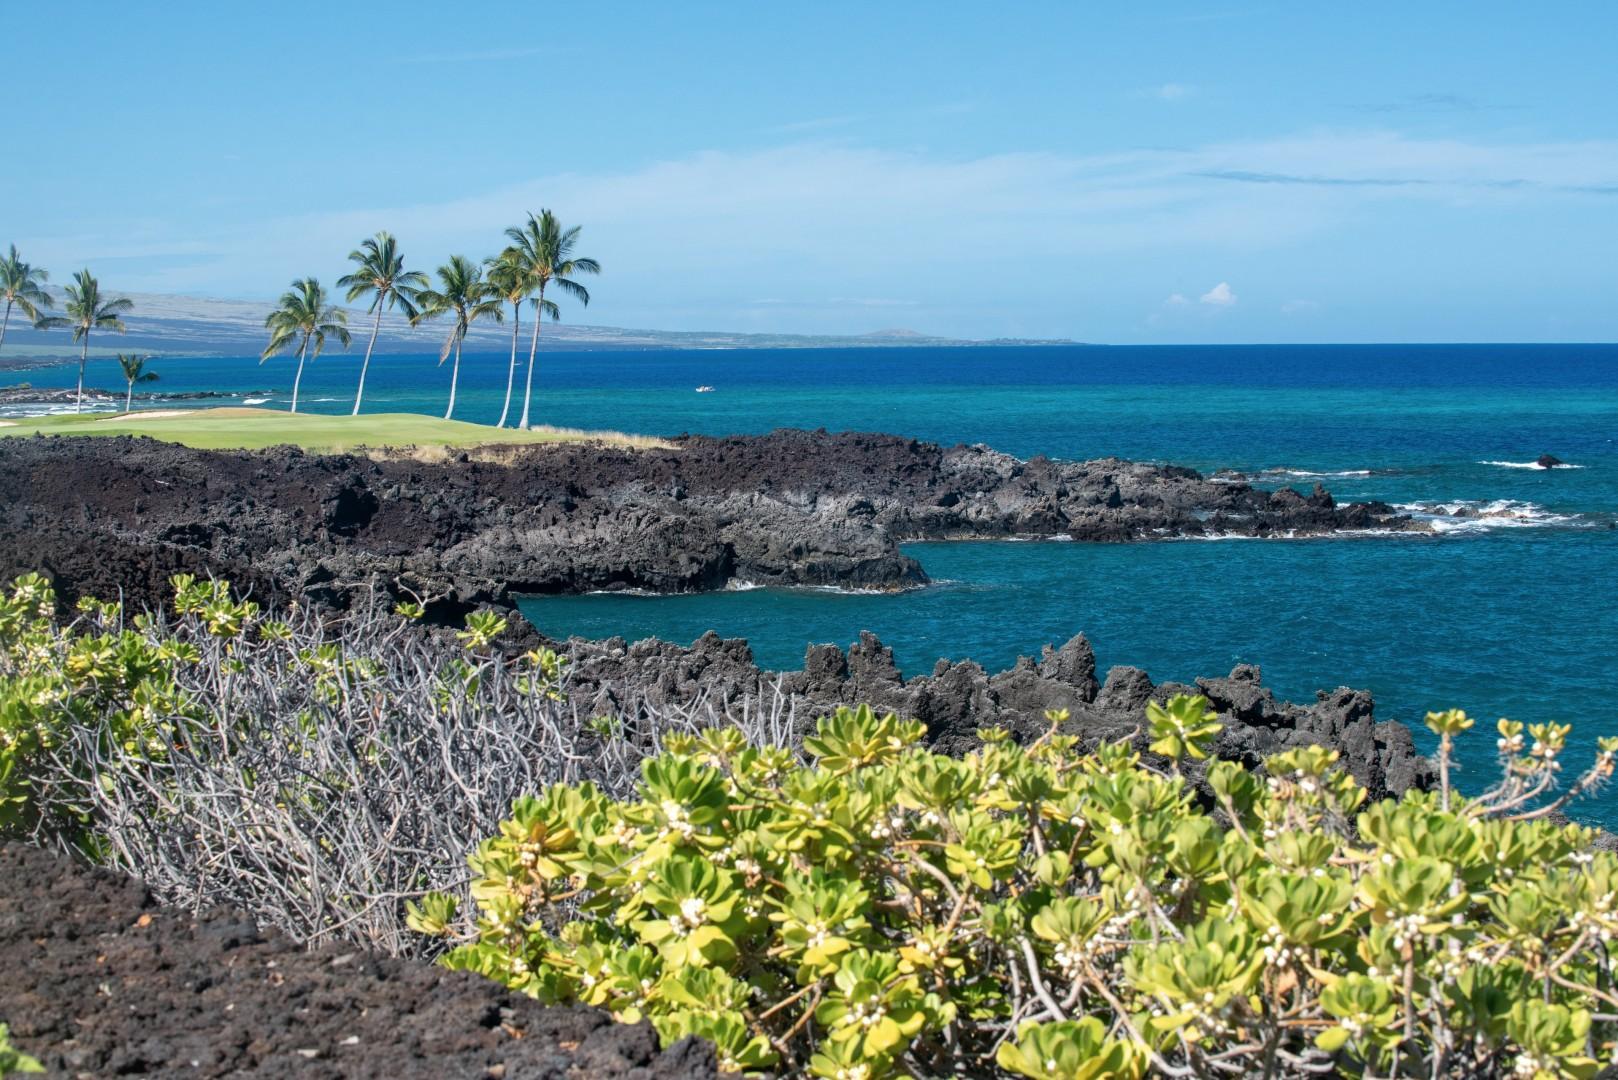 Big Island at its best - stunning view from Hali'i Kai Resort's pool